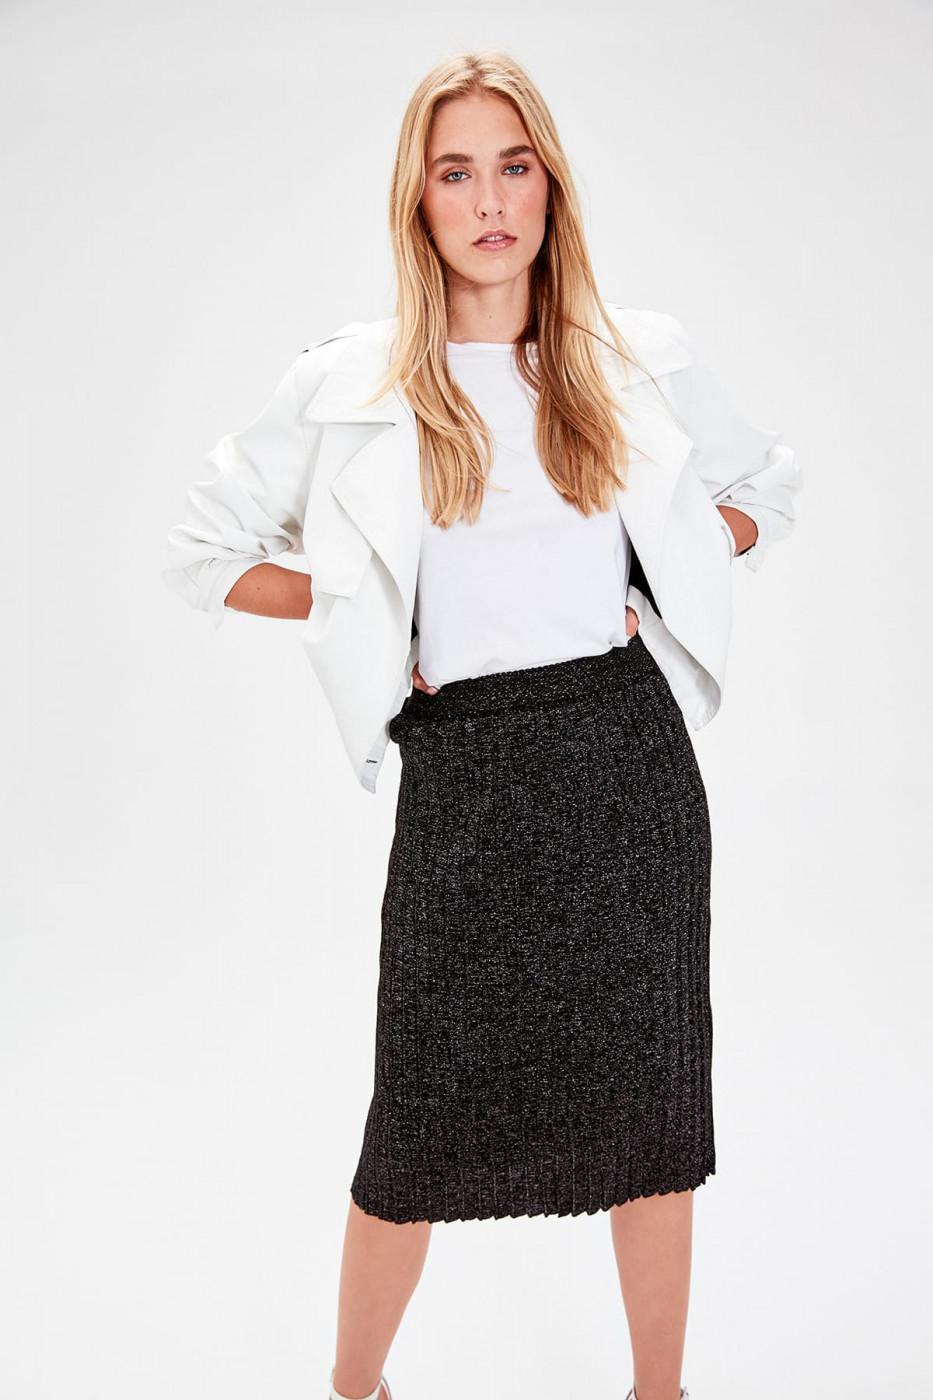 Trendyol Black Glitter Knitwear Skirt